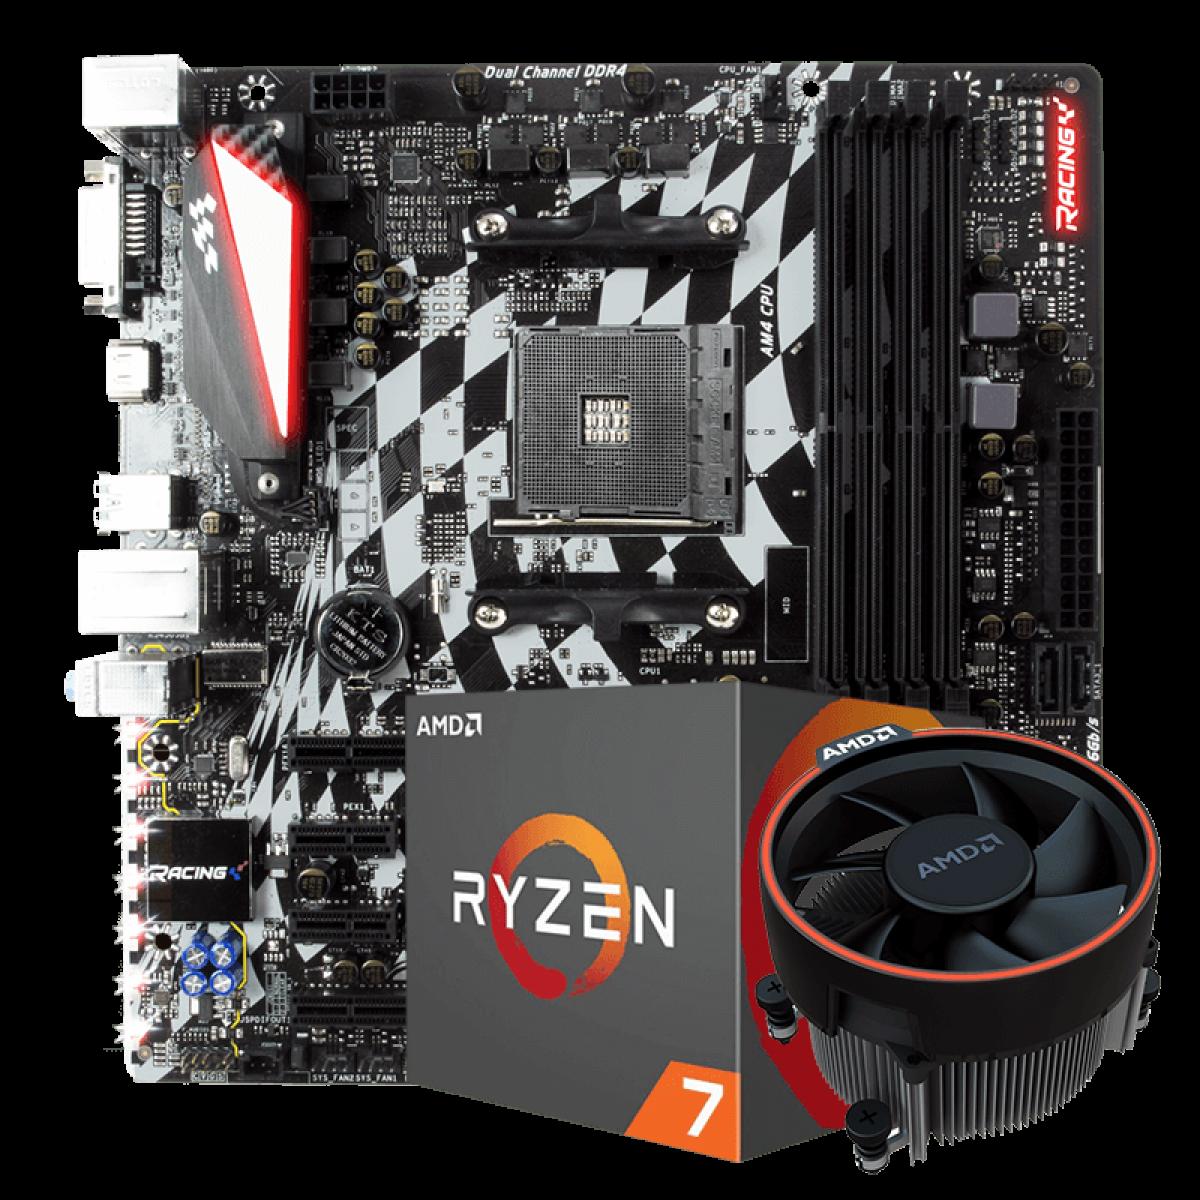 Kit Upgrade Placa Mãe Biostar Racing B350GT3 DDR4 AMD AM4 + Processador AMD Ryzen 7 2700 3.2GHz